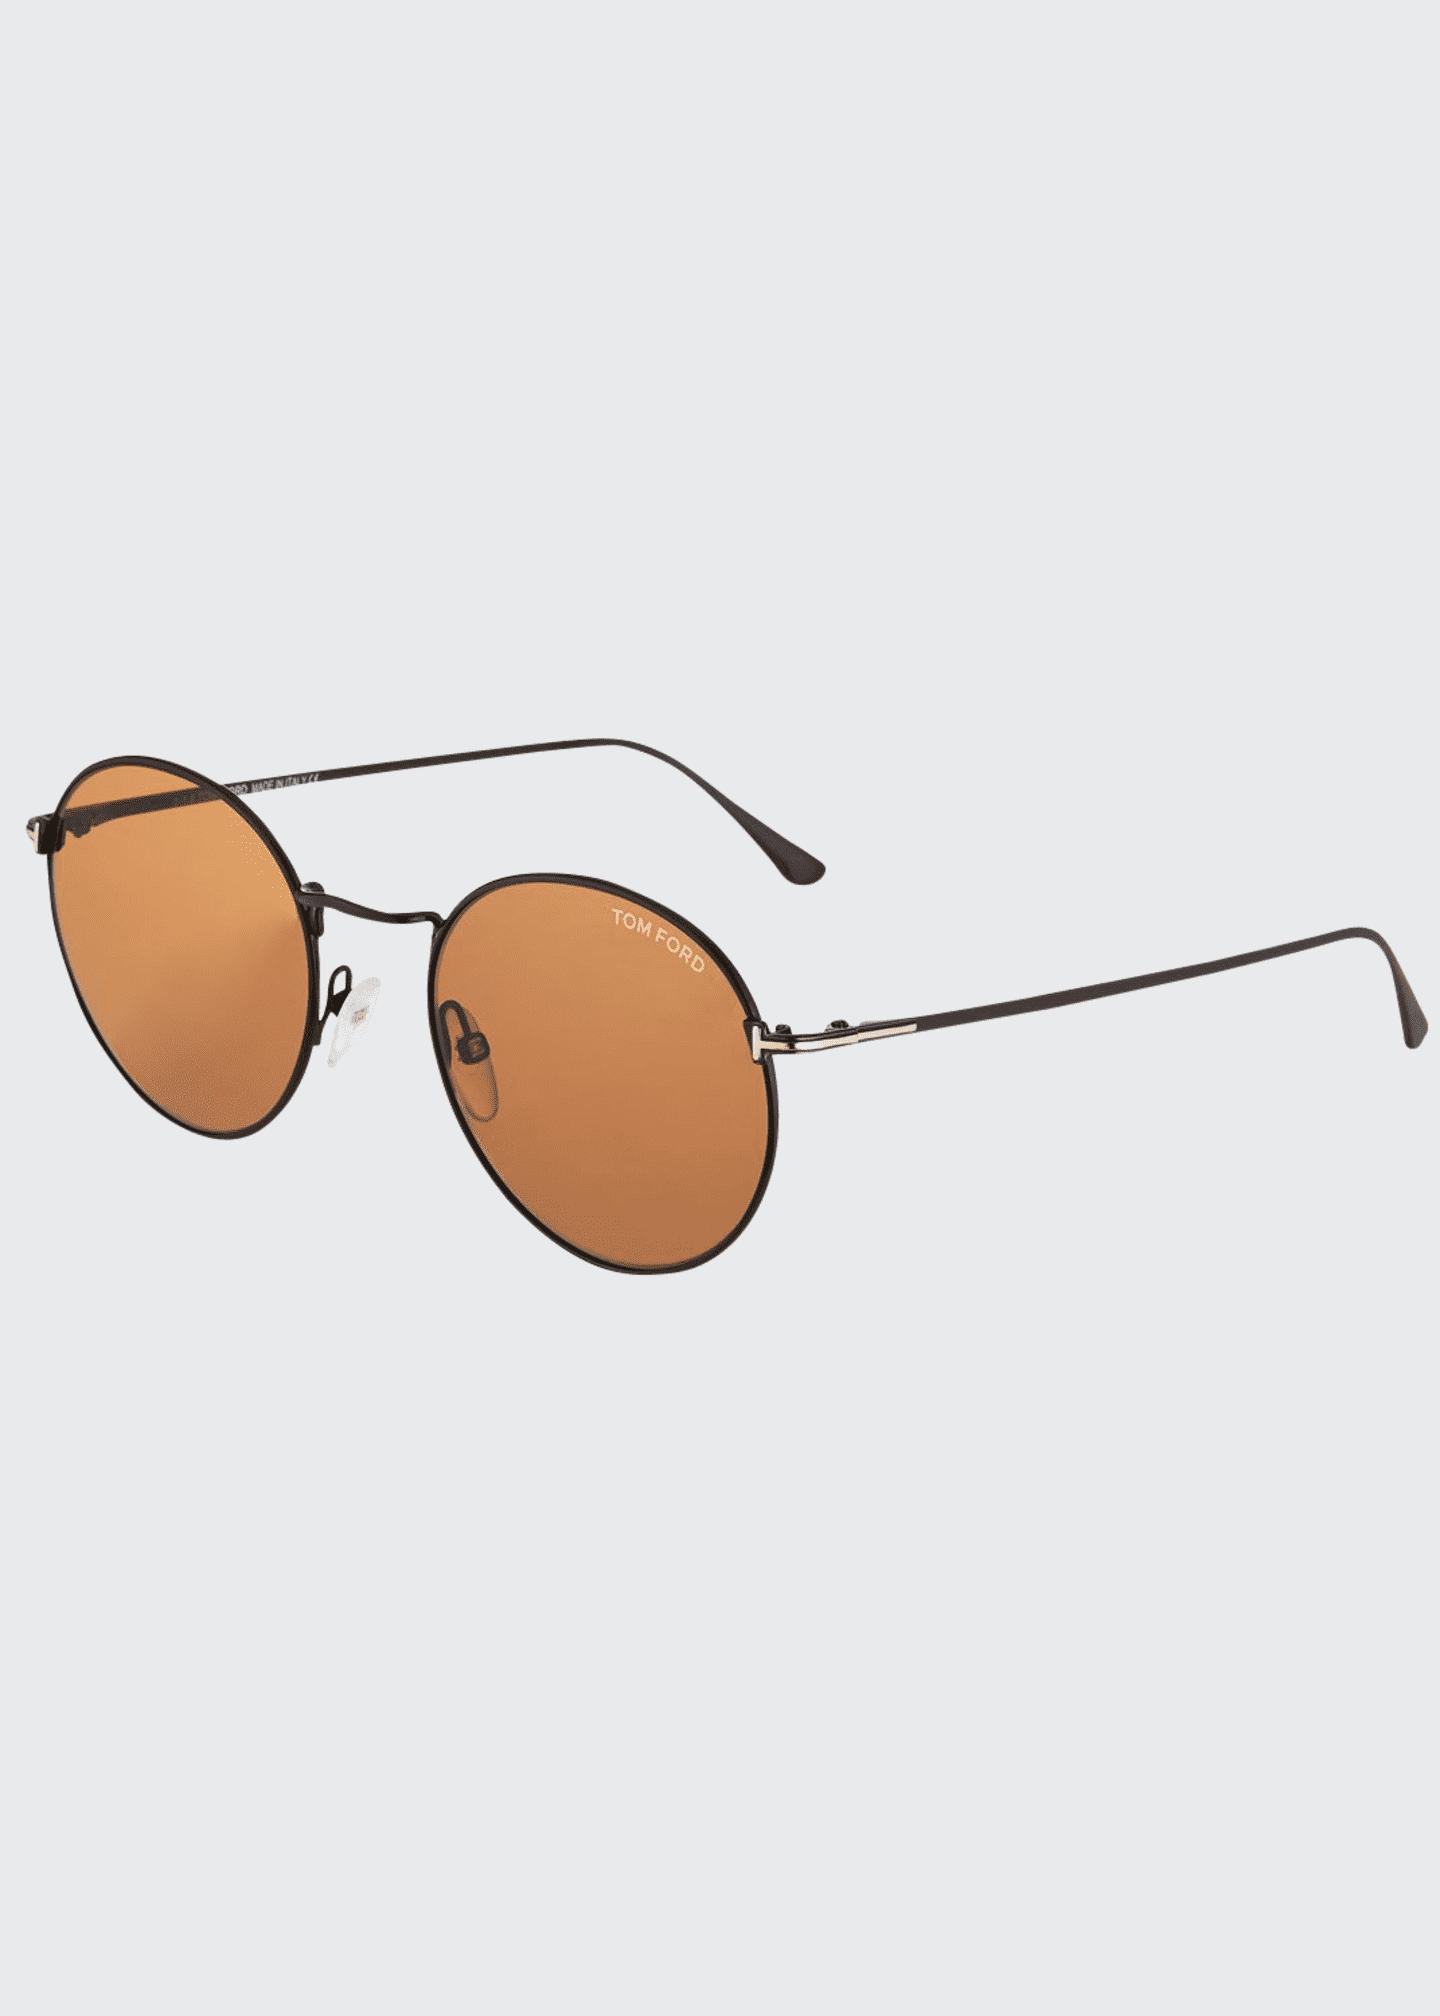 TOM FORD Men's Ryan Round Metal Sunglasses, Brown